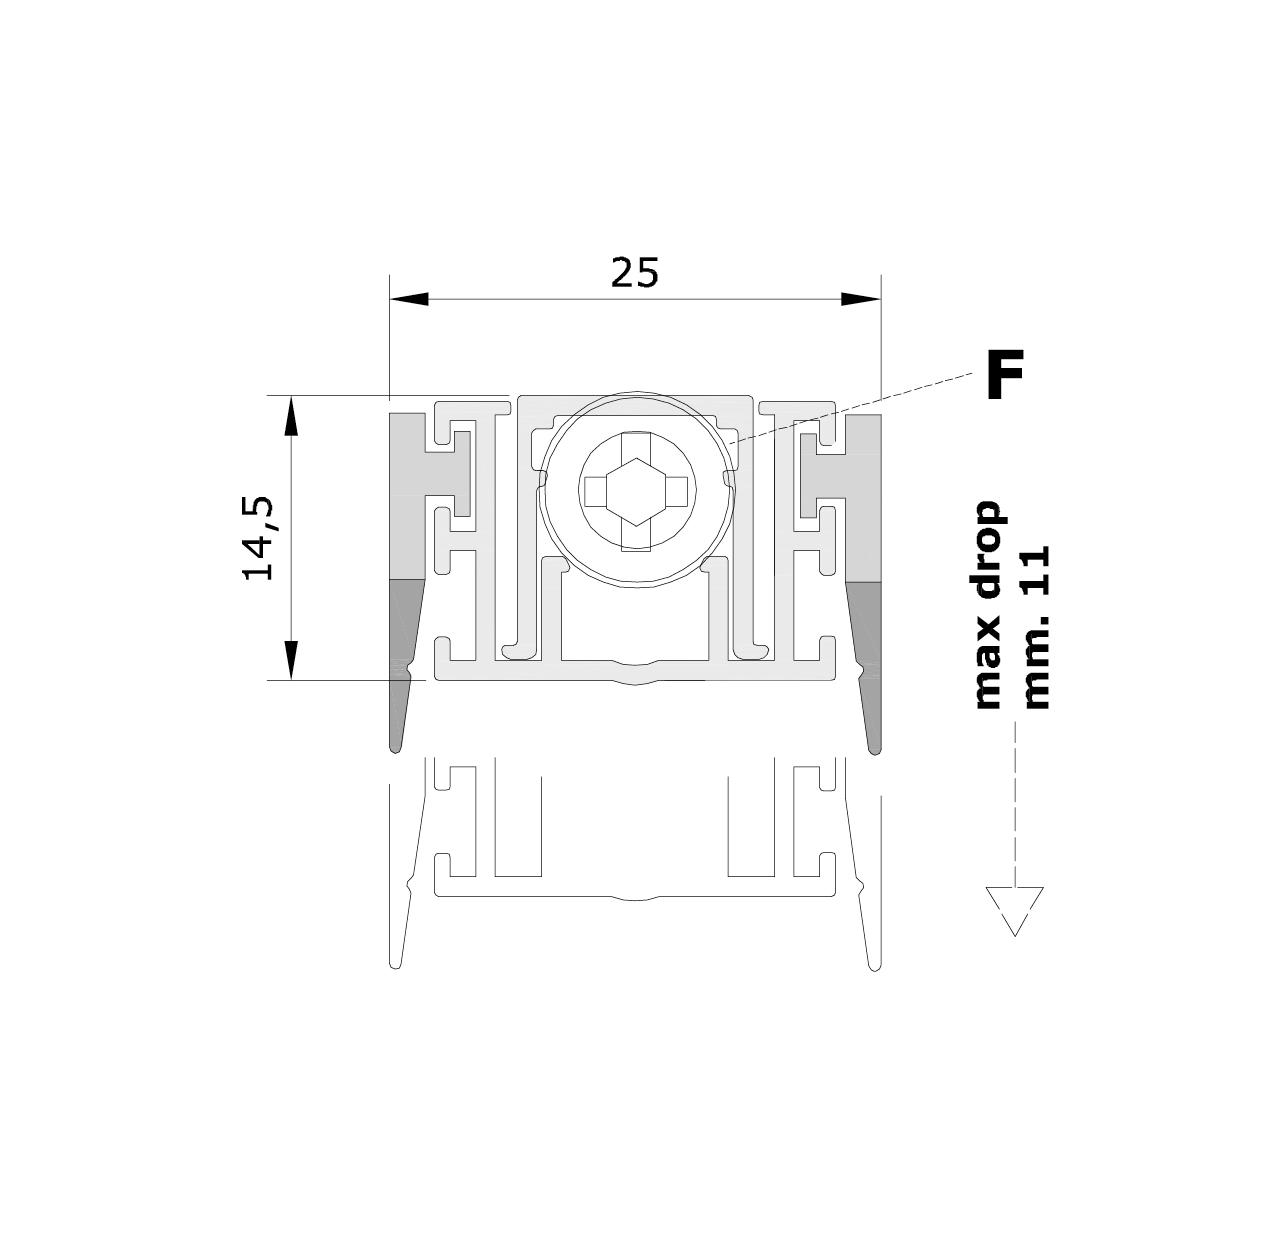 Misure standard (mm) per il paraspifferi Serie Special 120